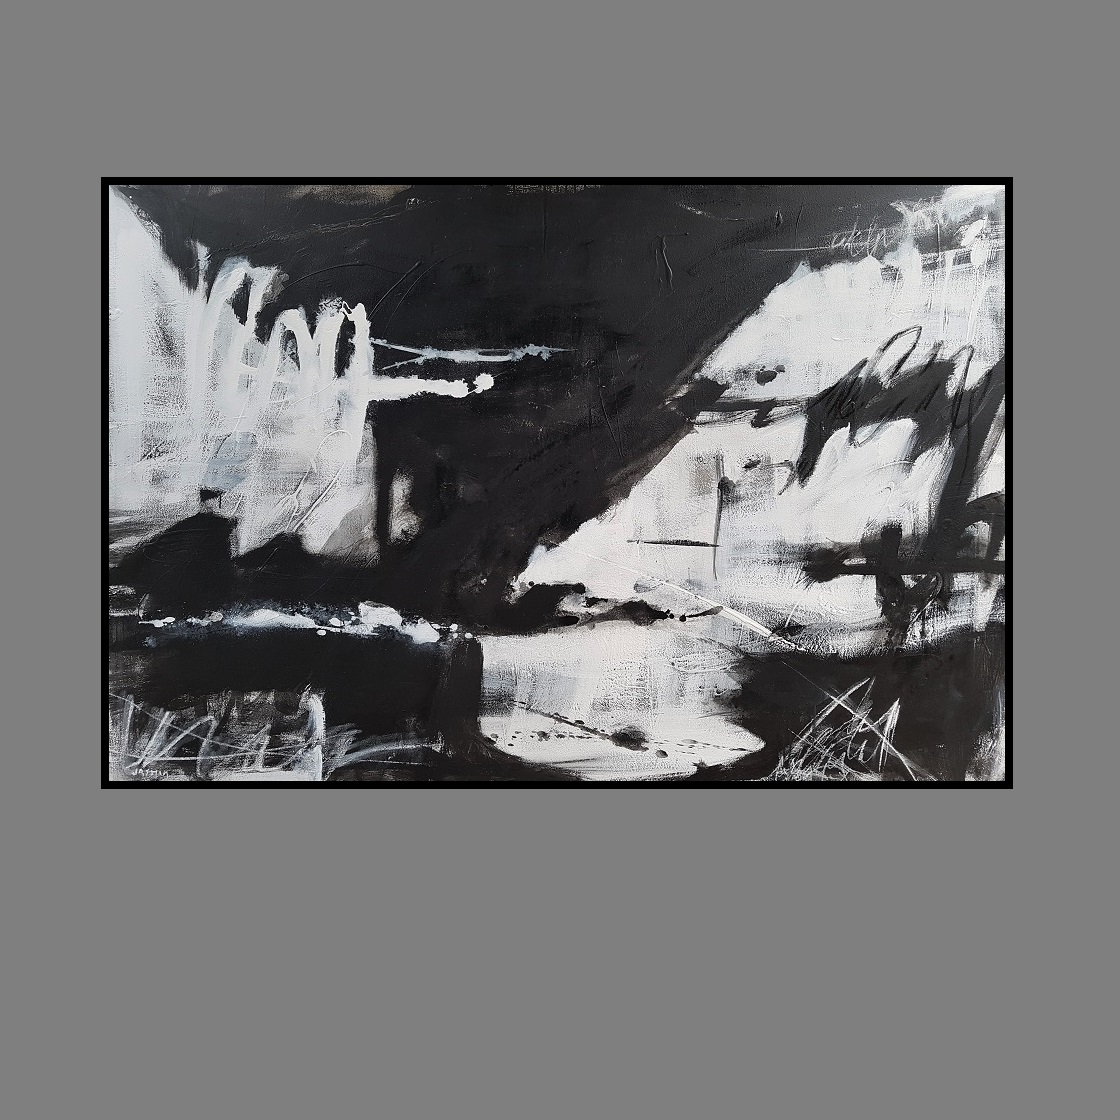 Black Lines 18. 120 x 180cm black frame